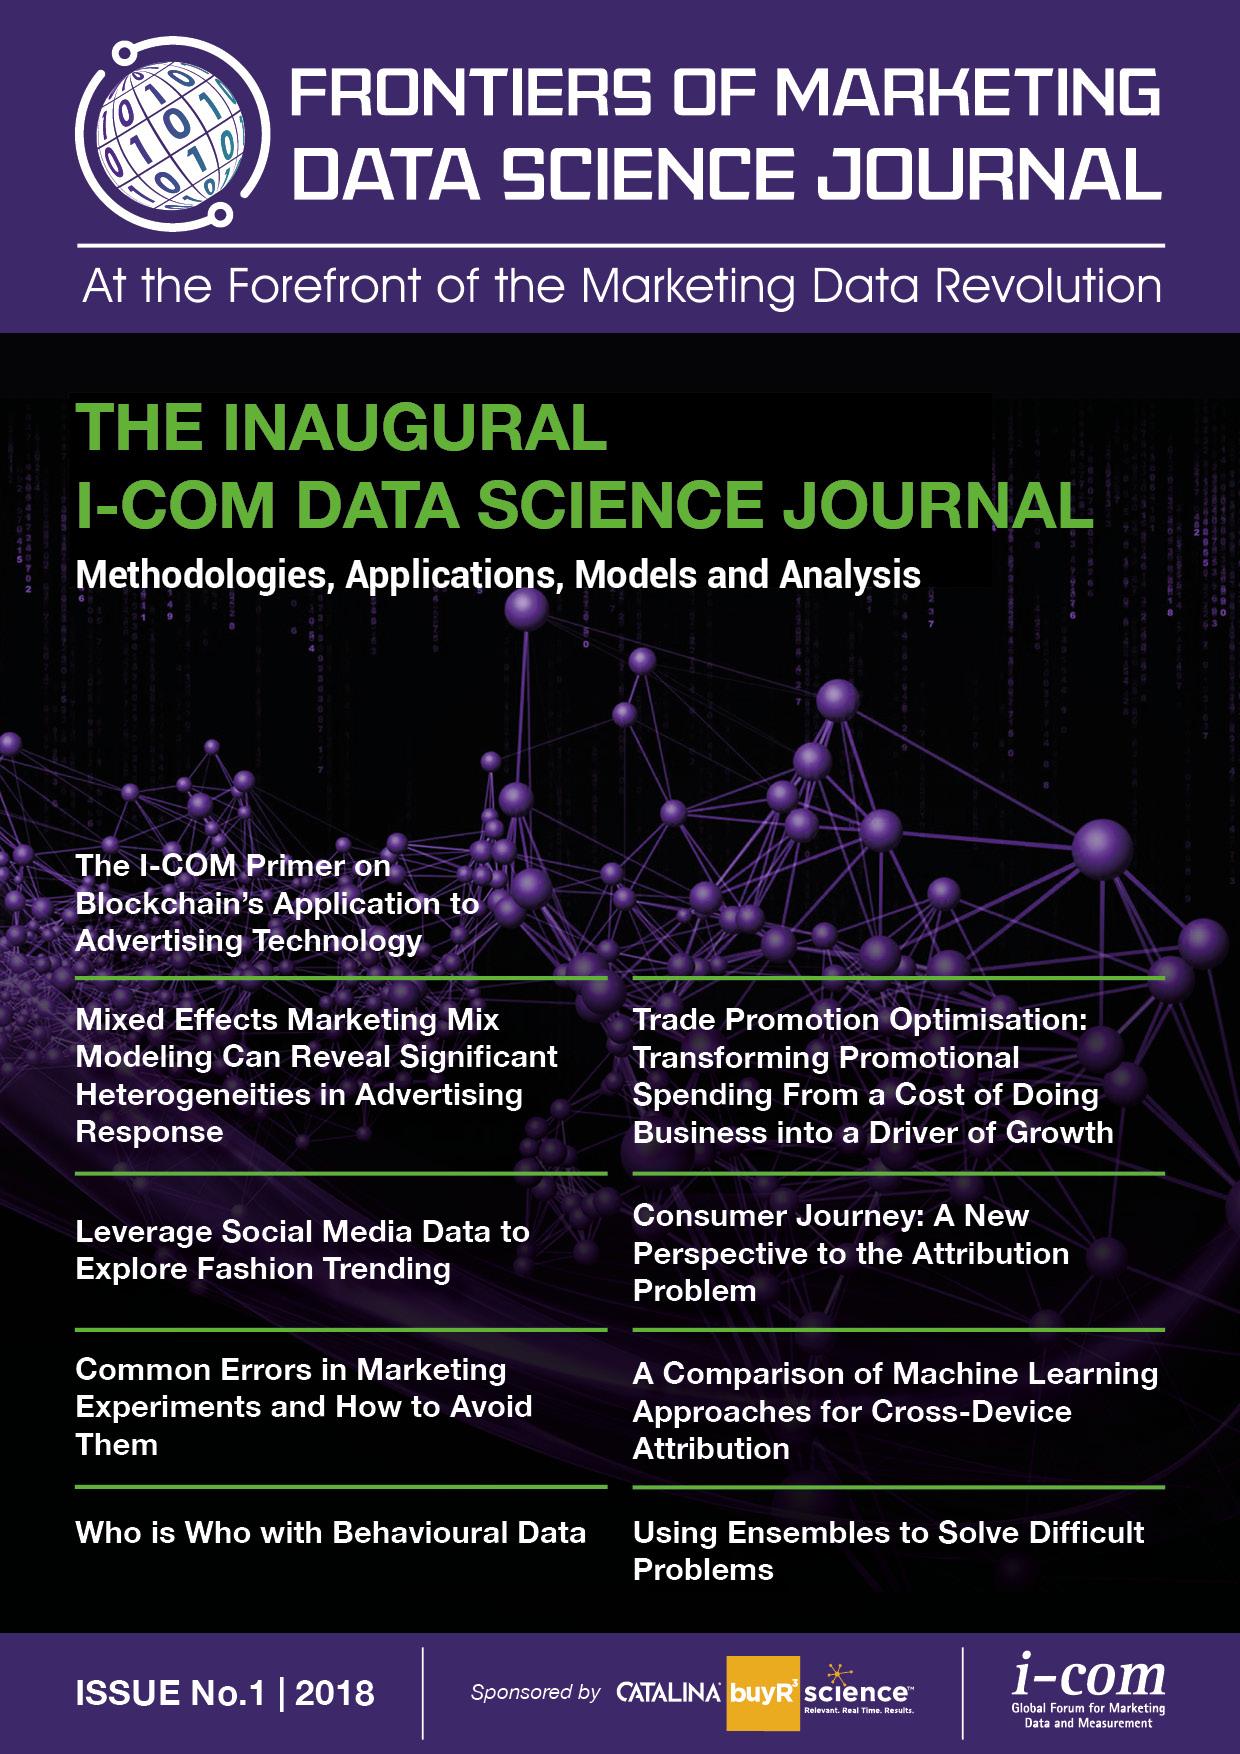 FMDS-Journal-Cover-01-2018.jpg